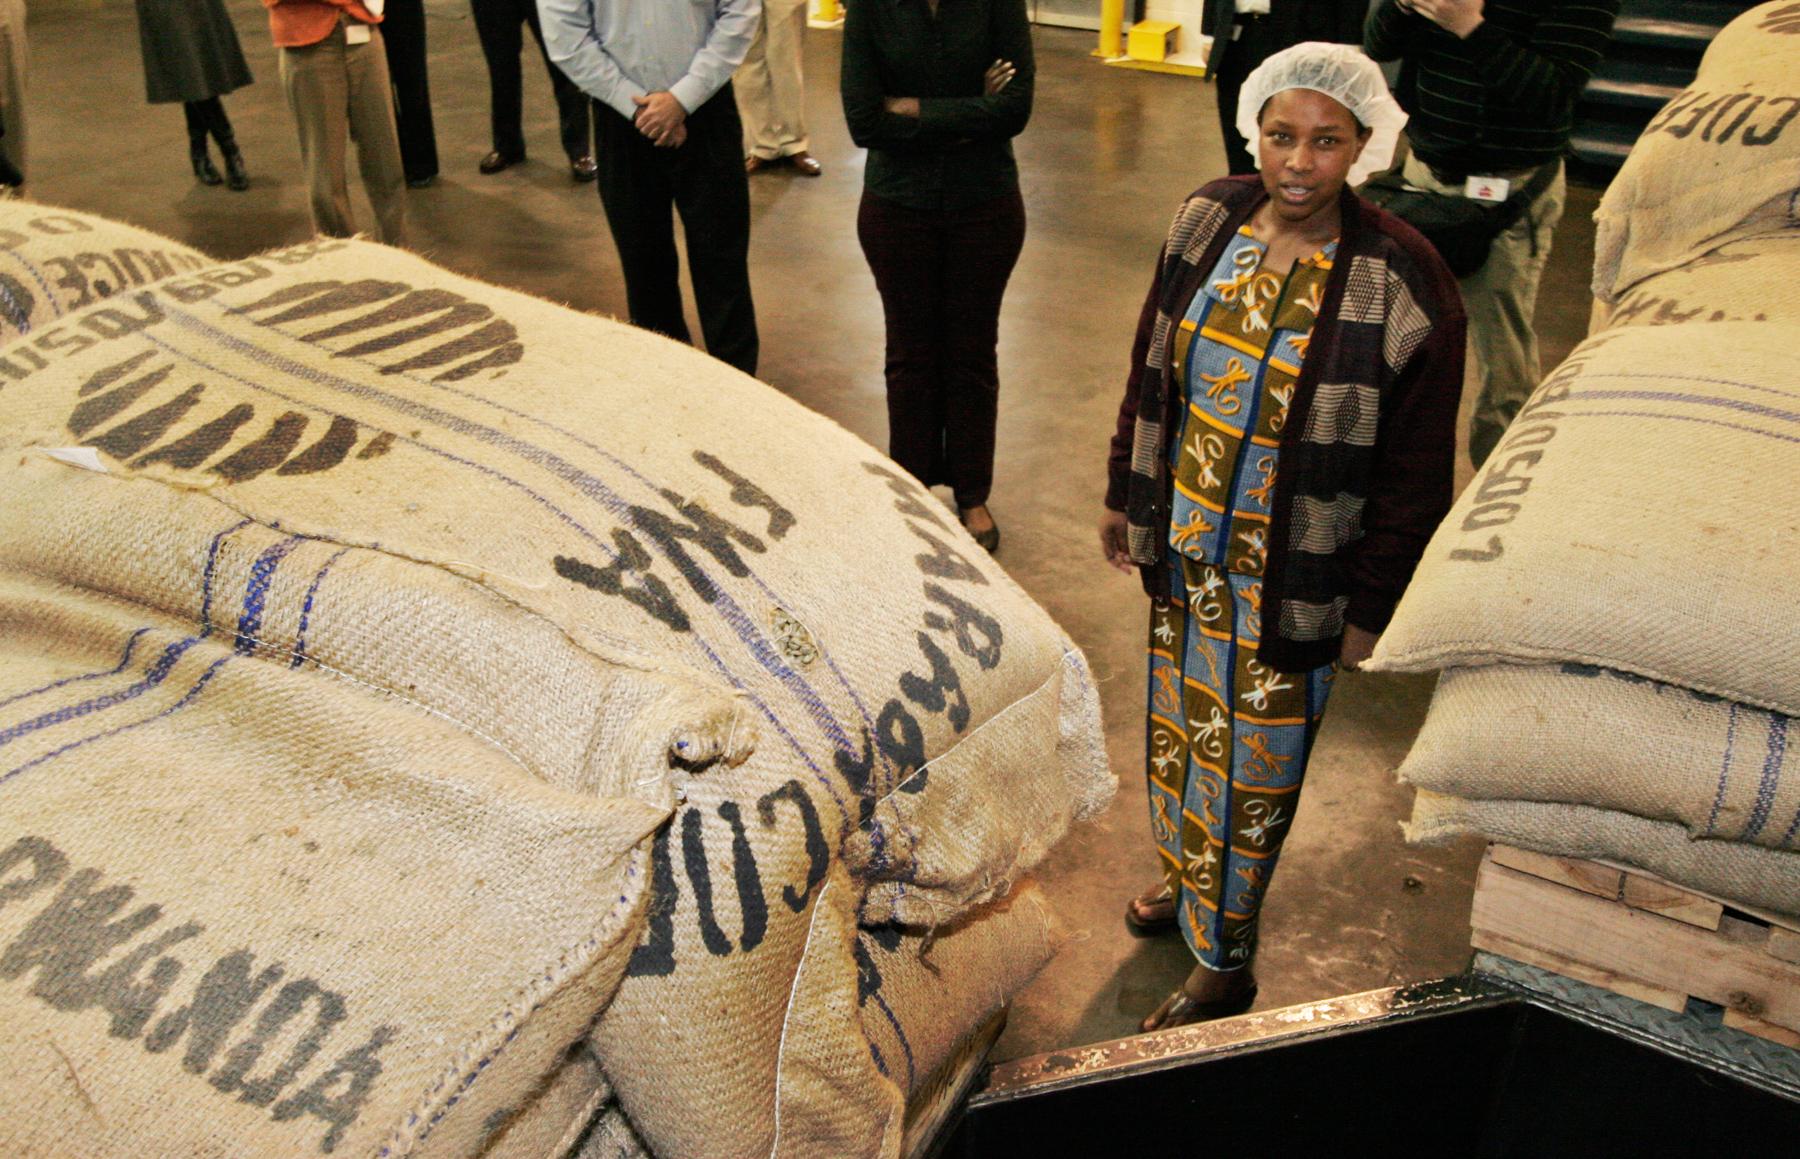 Woman standing between bags of coffee (© AP Images)